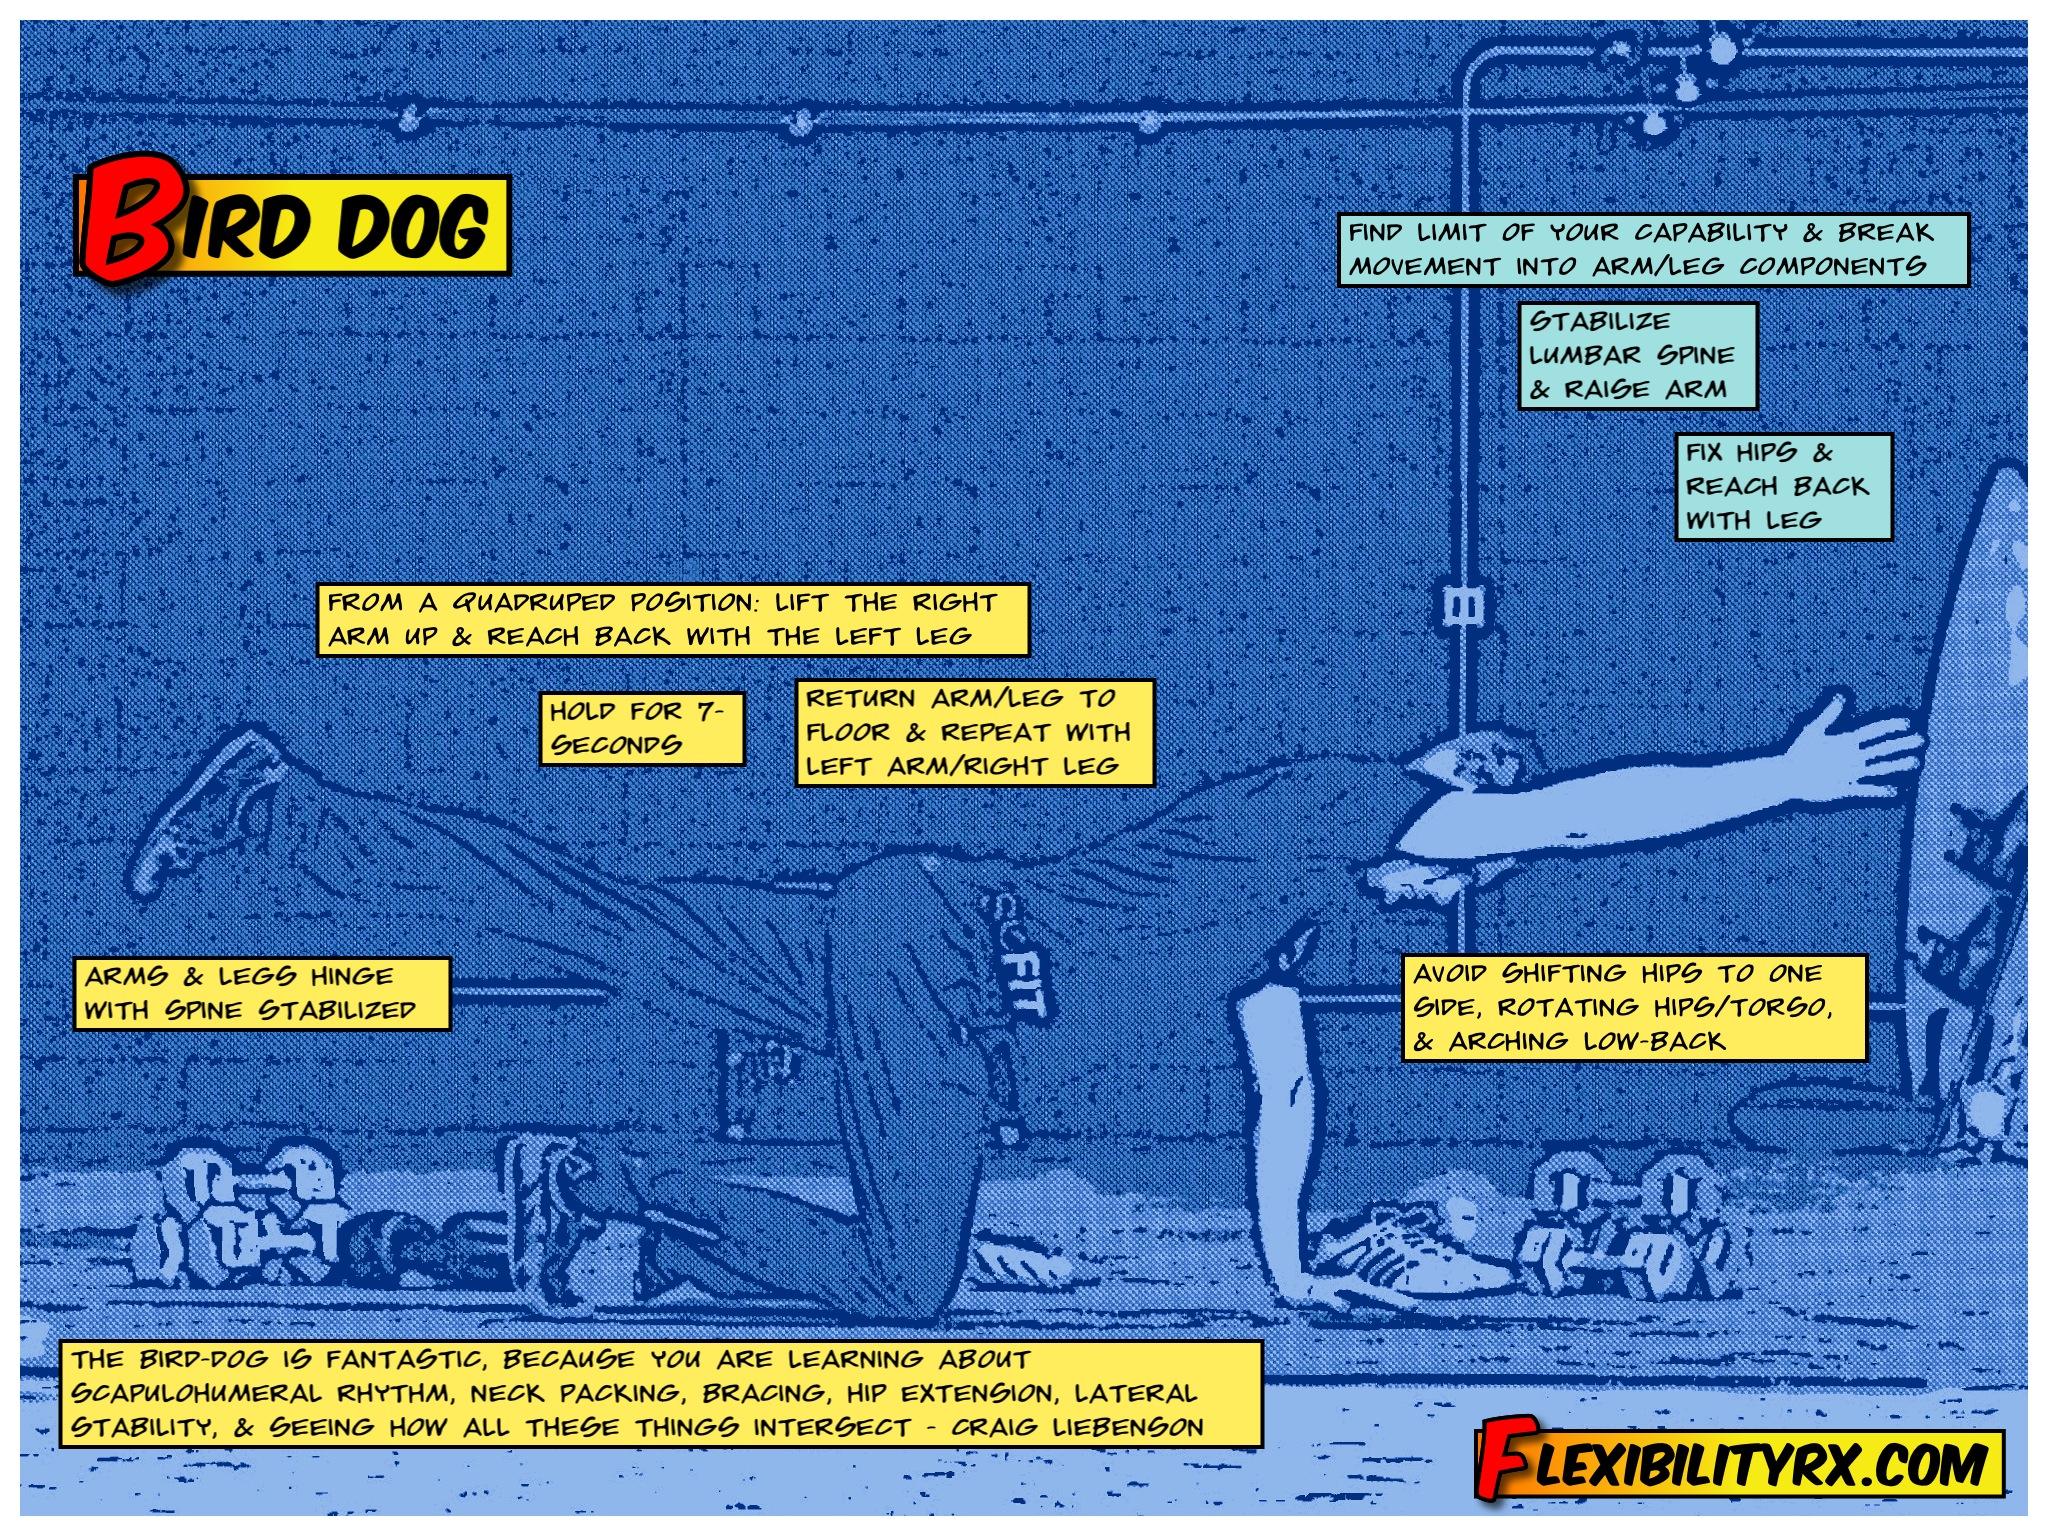 The Bird Dog Exercise More Than Rotary Stability Flexibilityrx